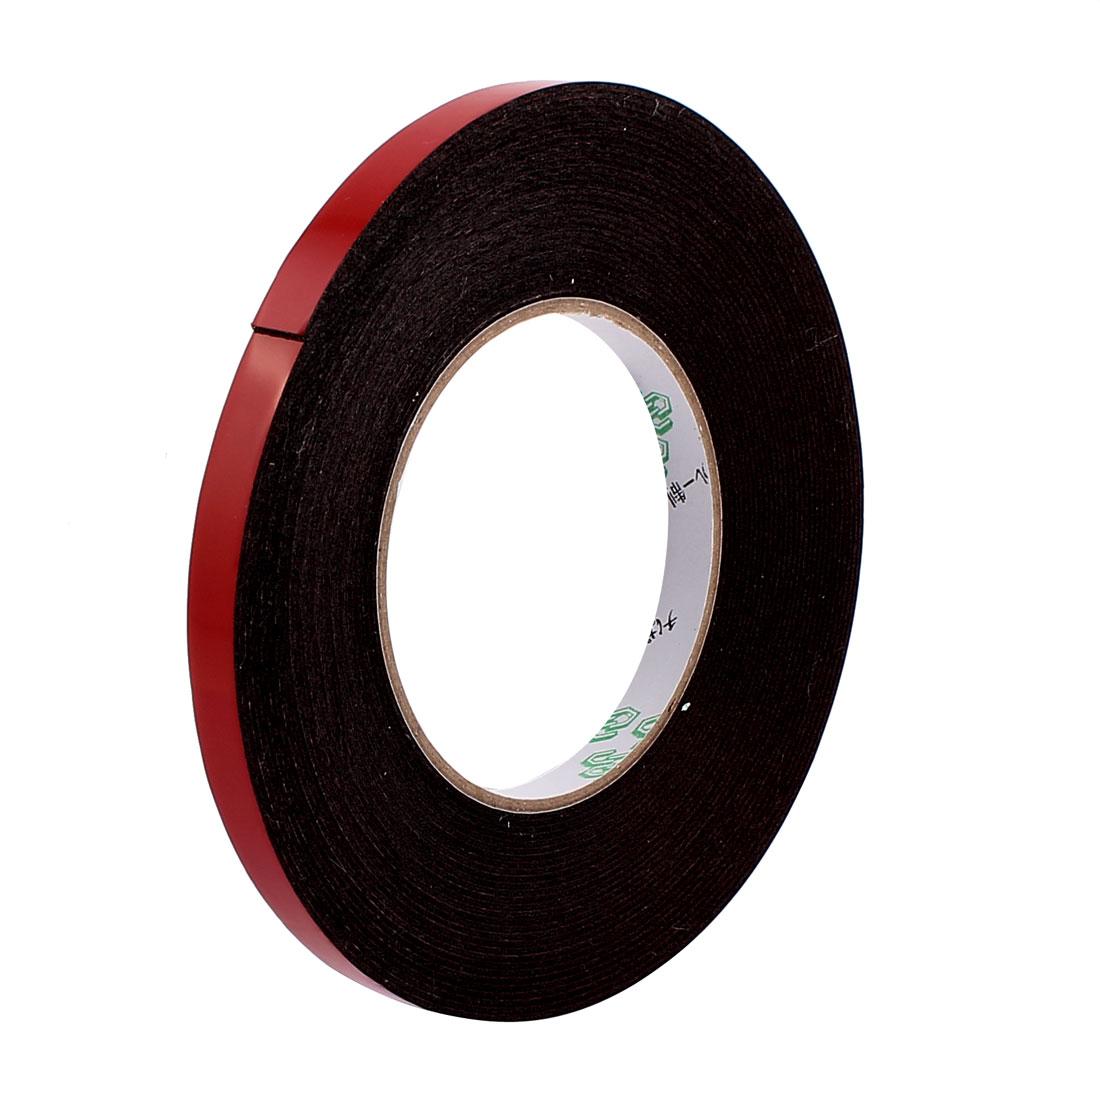 10mmx1mm Double Sided Sponge Tape Adhesive Sticker Foam Glue Strip Sealing 10 Meters 33Ft